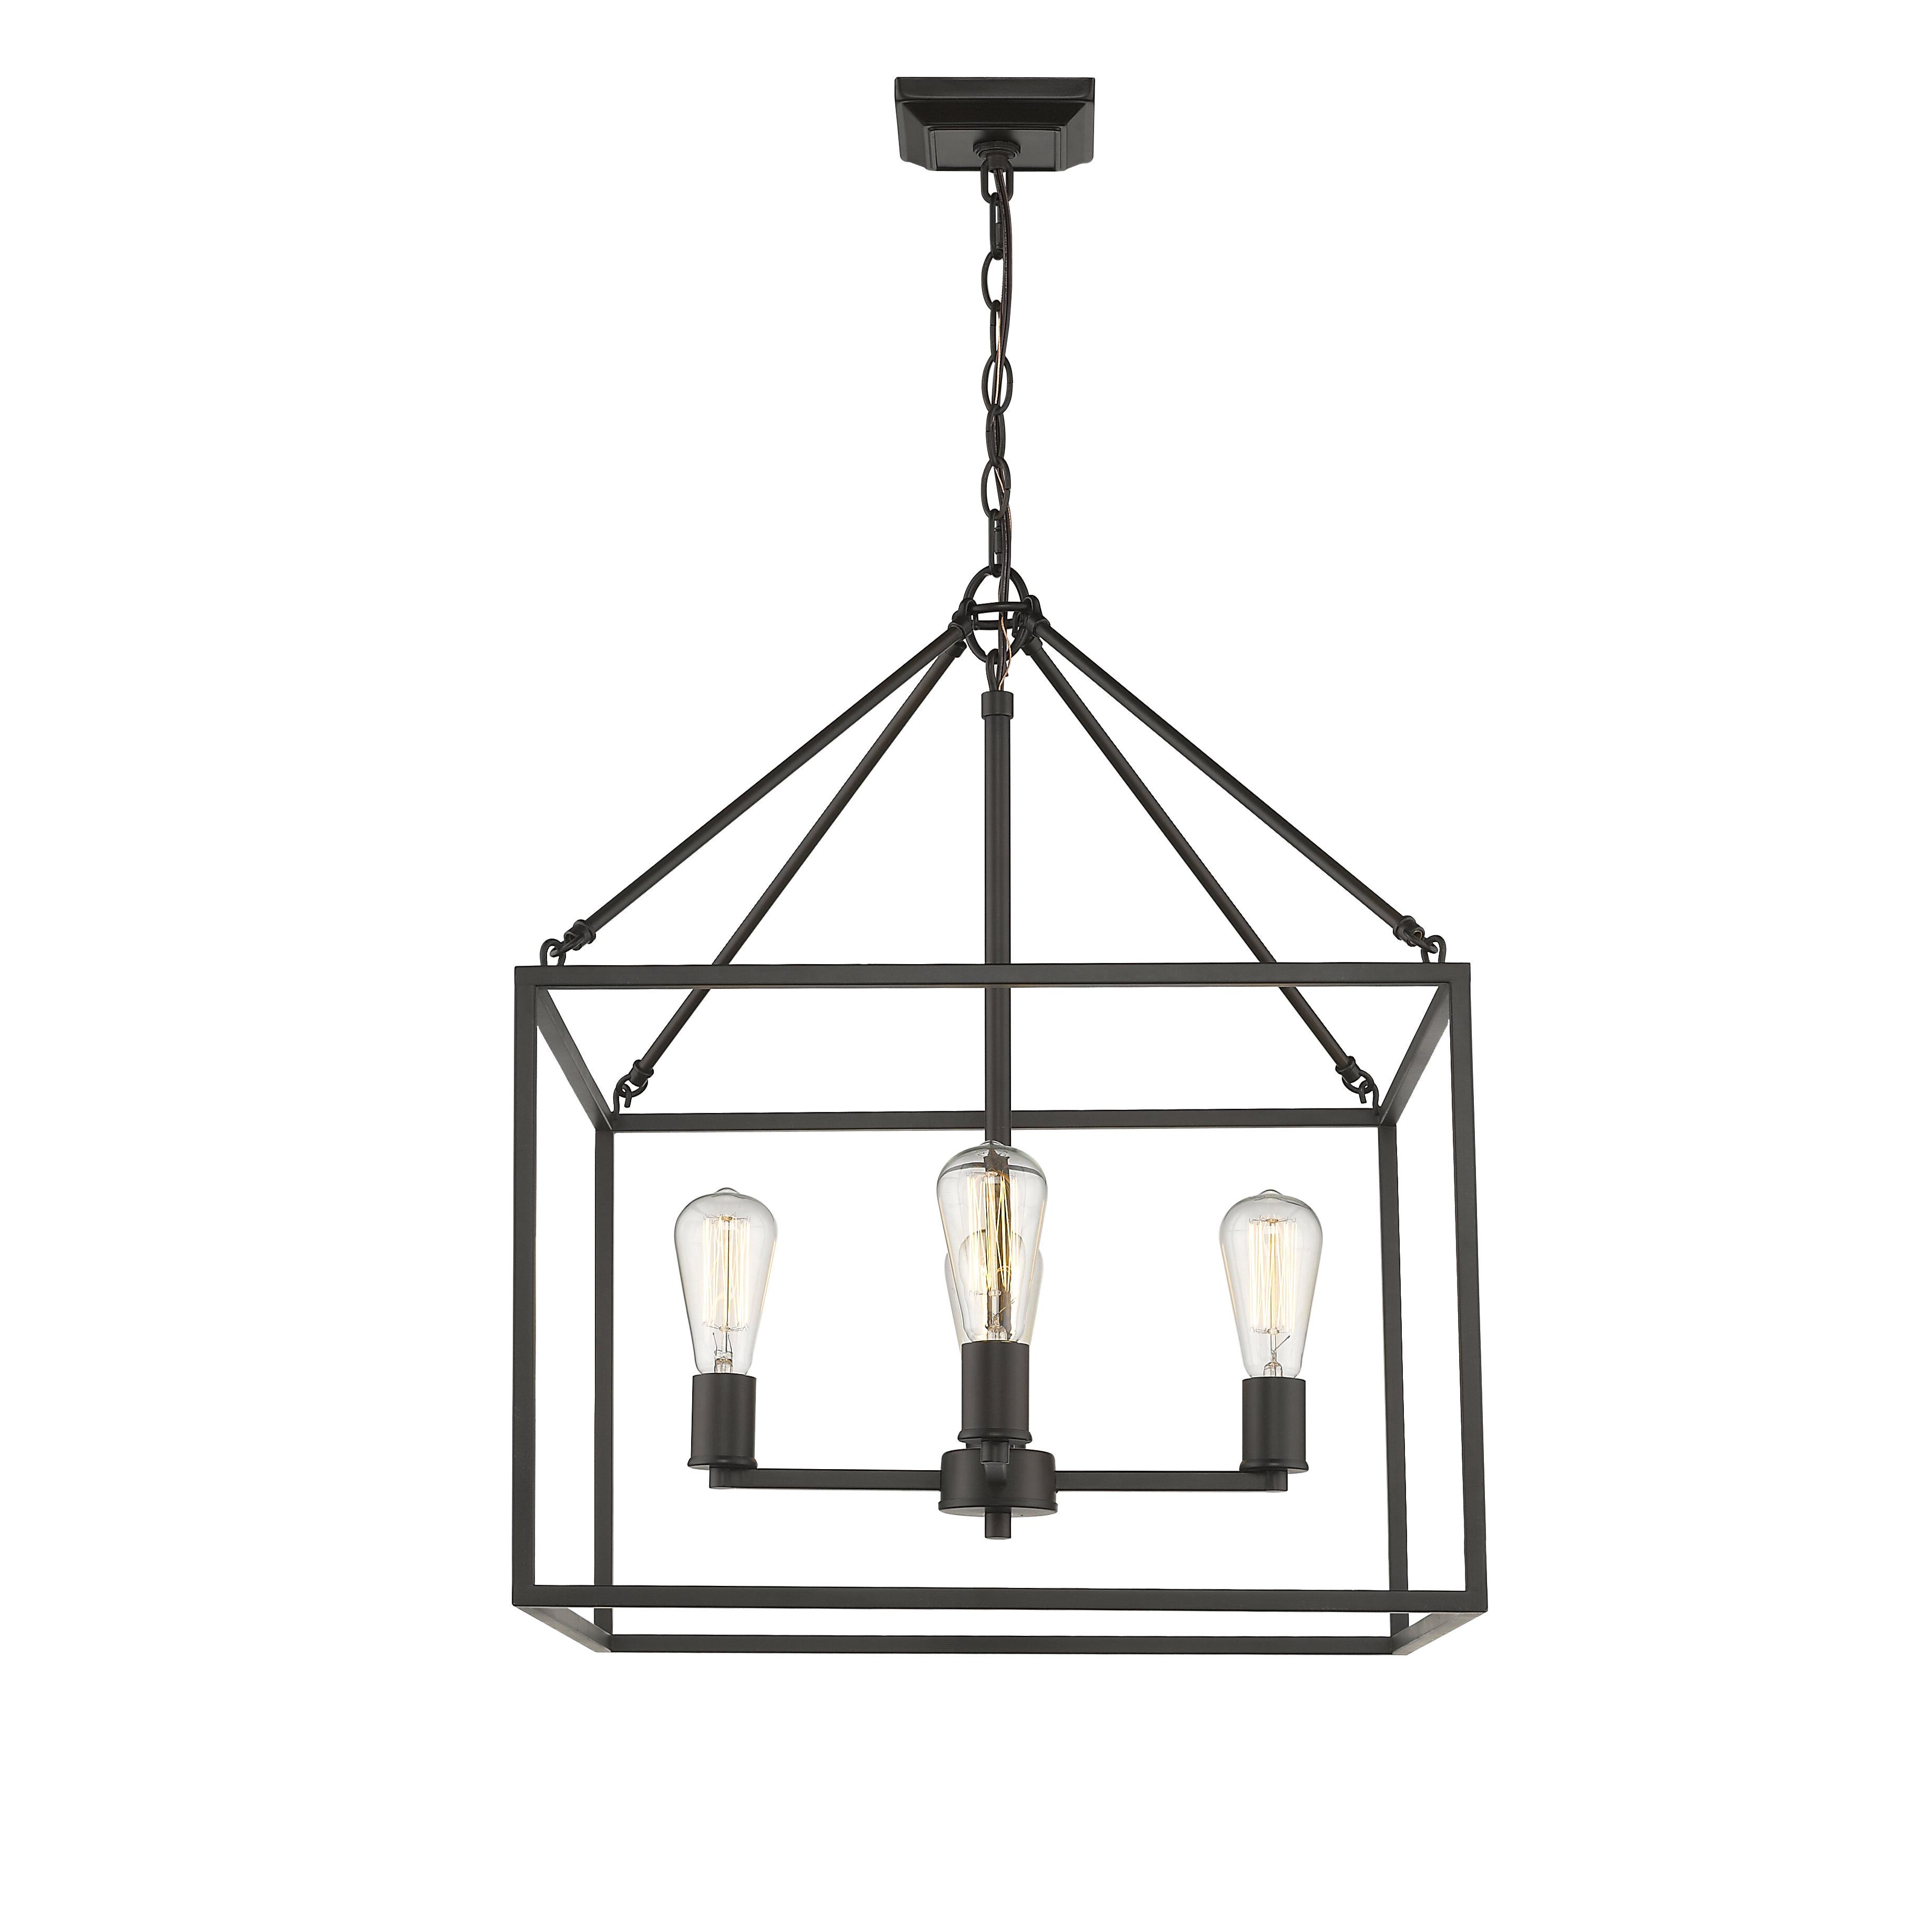 Most Up To Date Thorne 6 Light Lantern Square / Rectangle Pendants Regarding Zabel 4 Light Lantern Square / Rectangle Pendant (View 4 of 25)